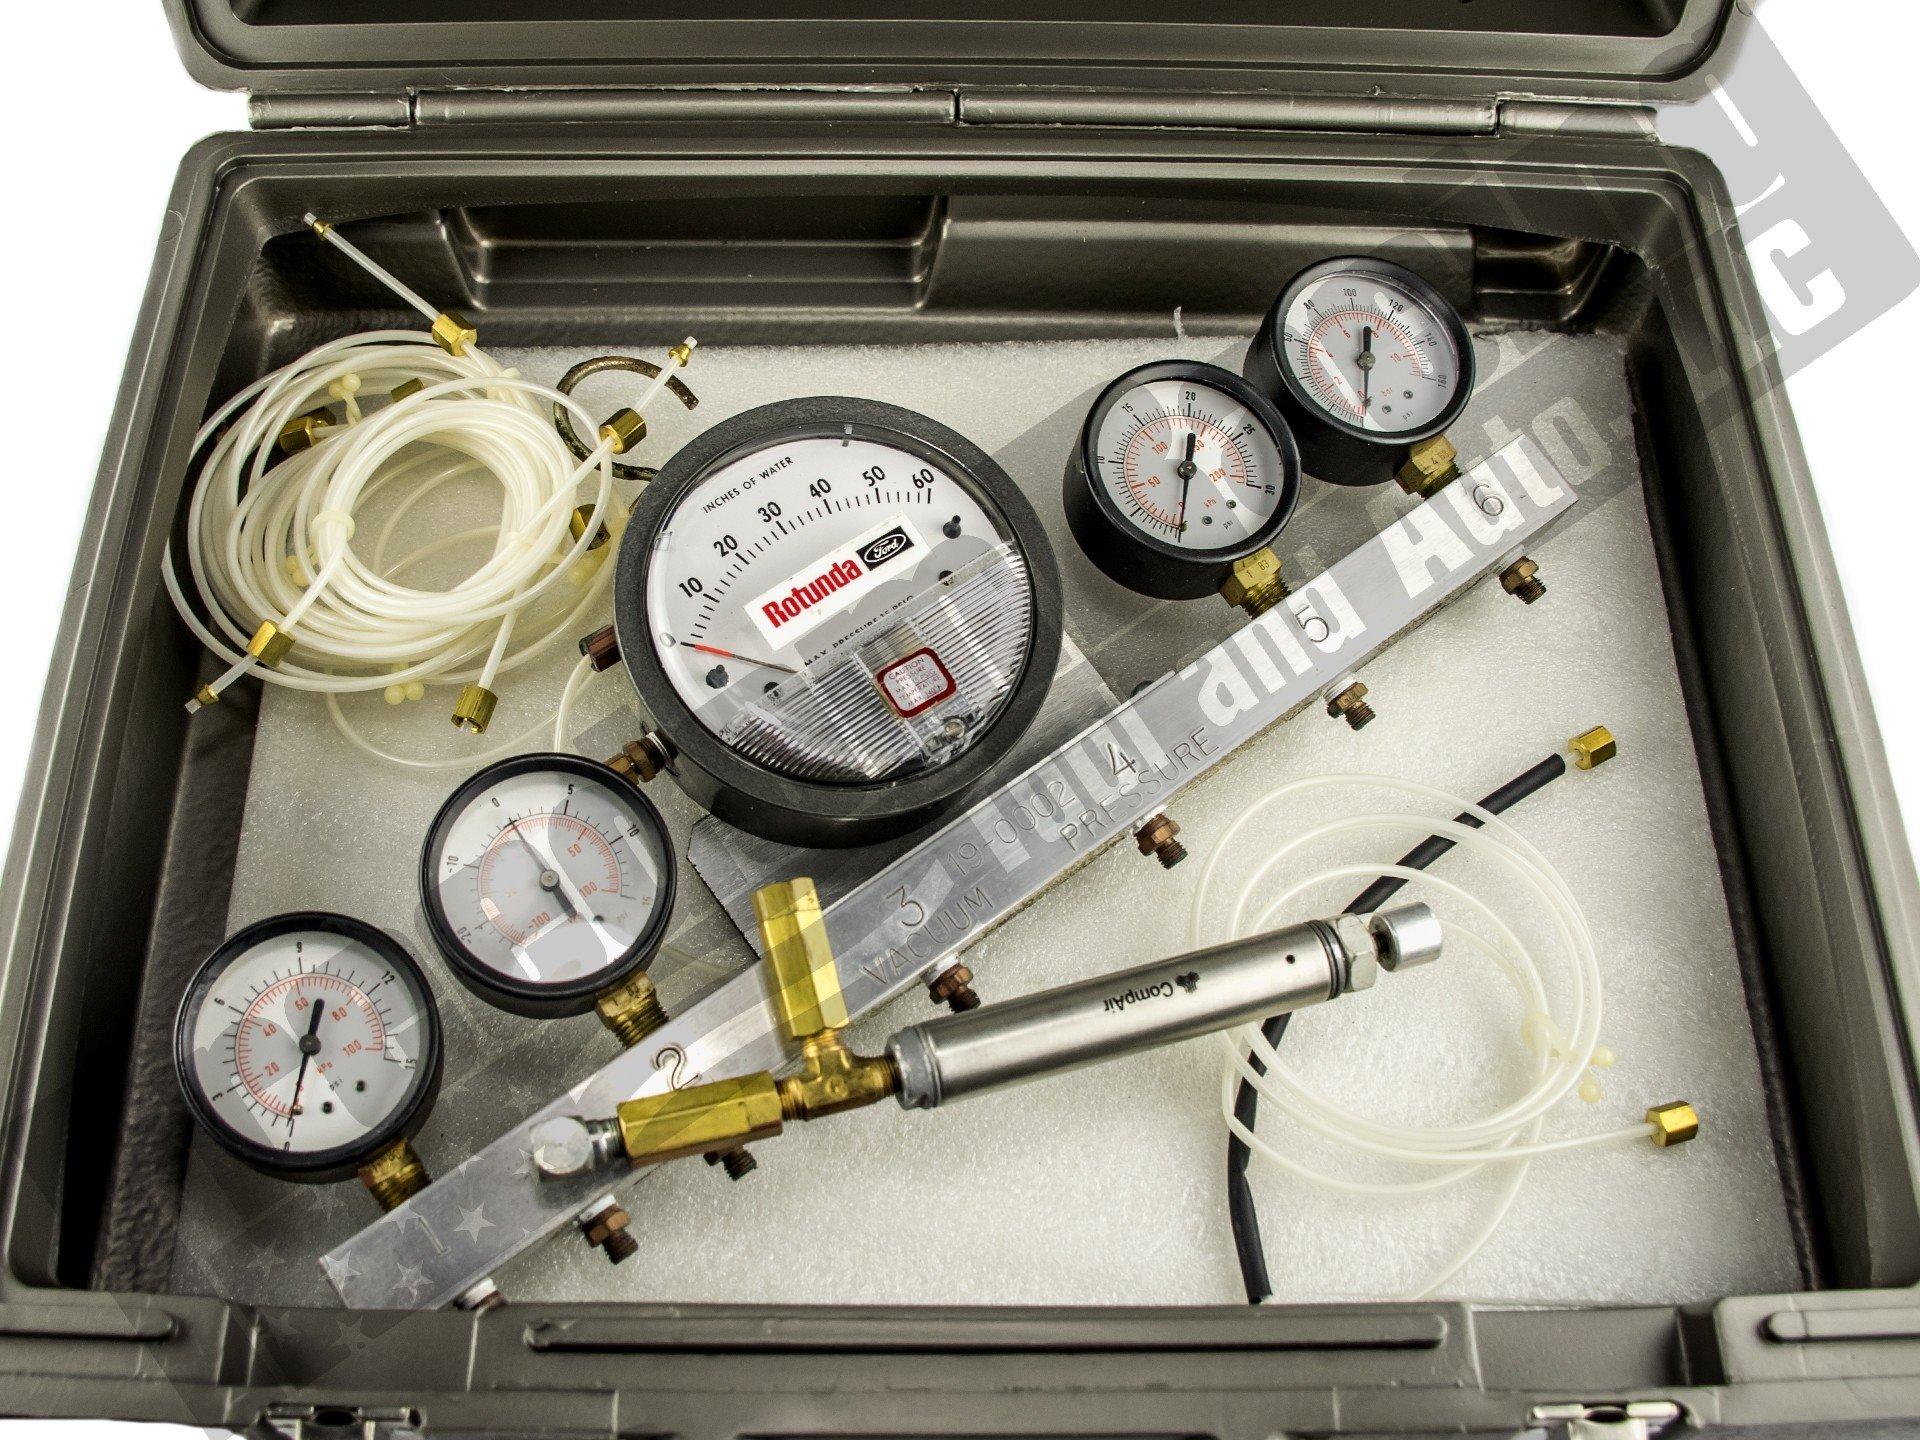 014-00761 Vacuum Pressure Test Gauge Bar